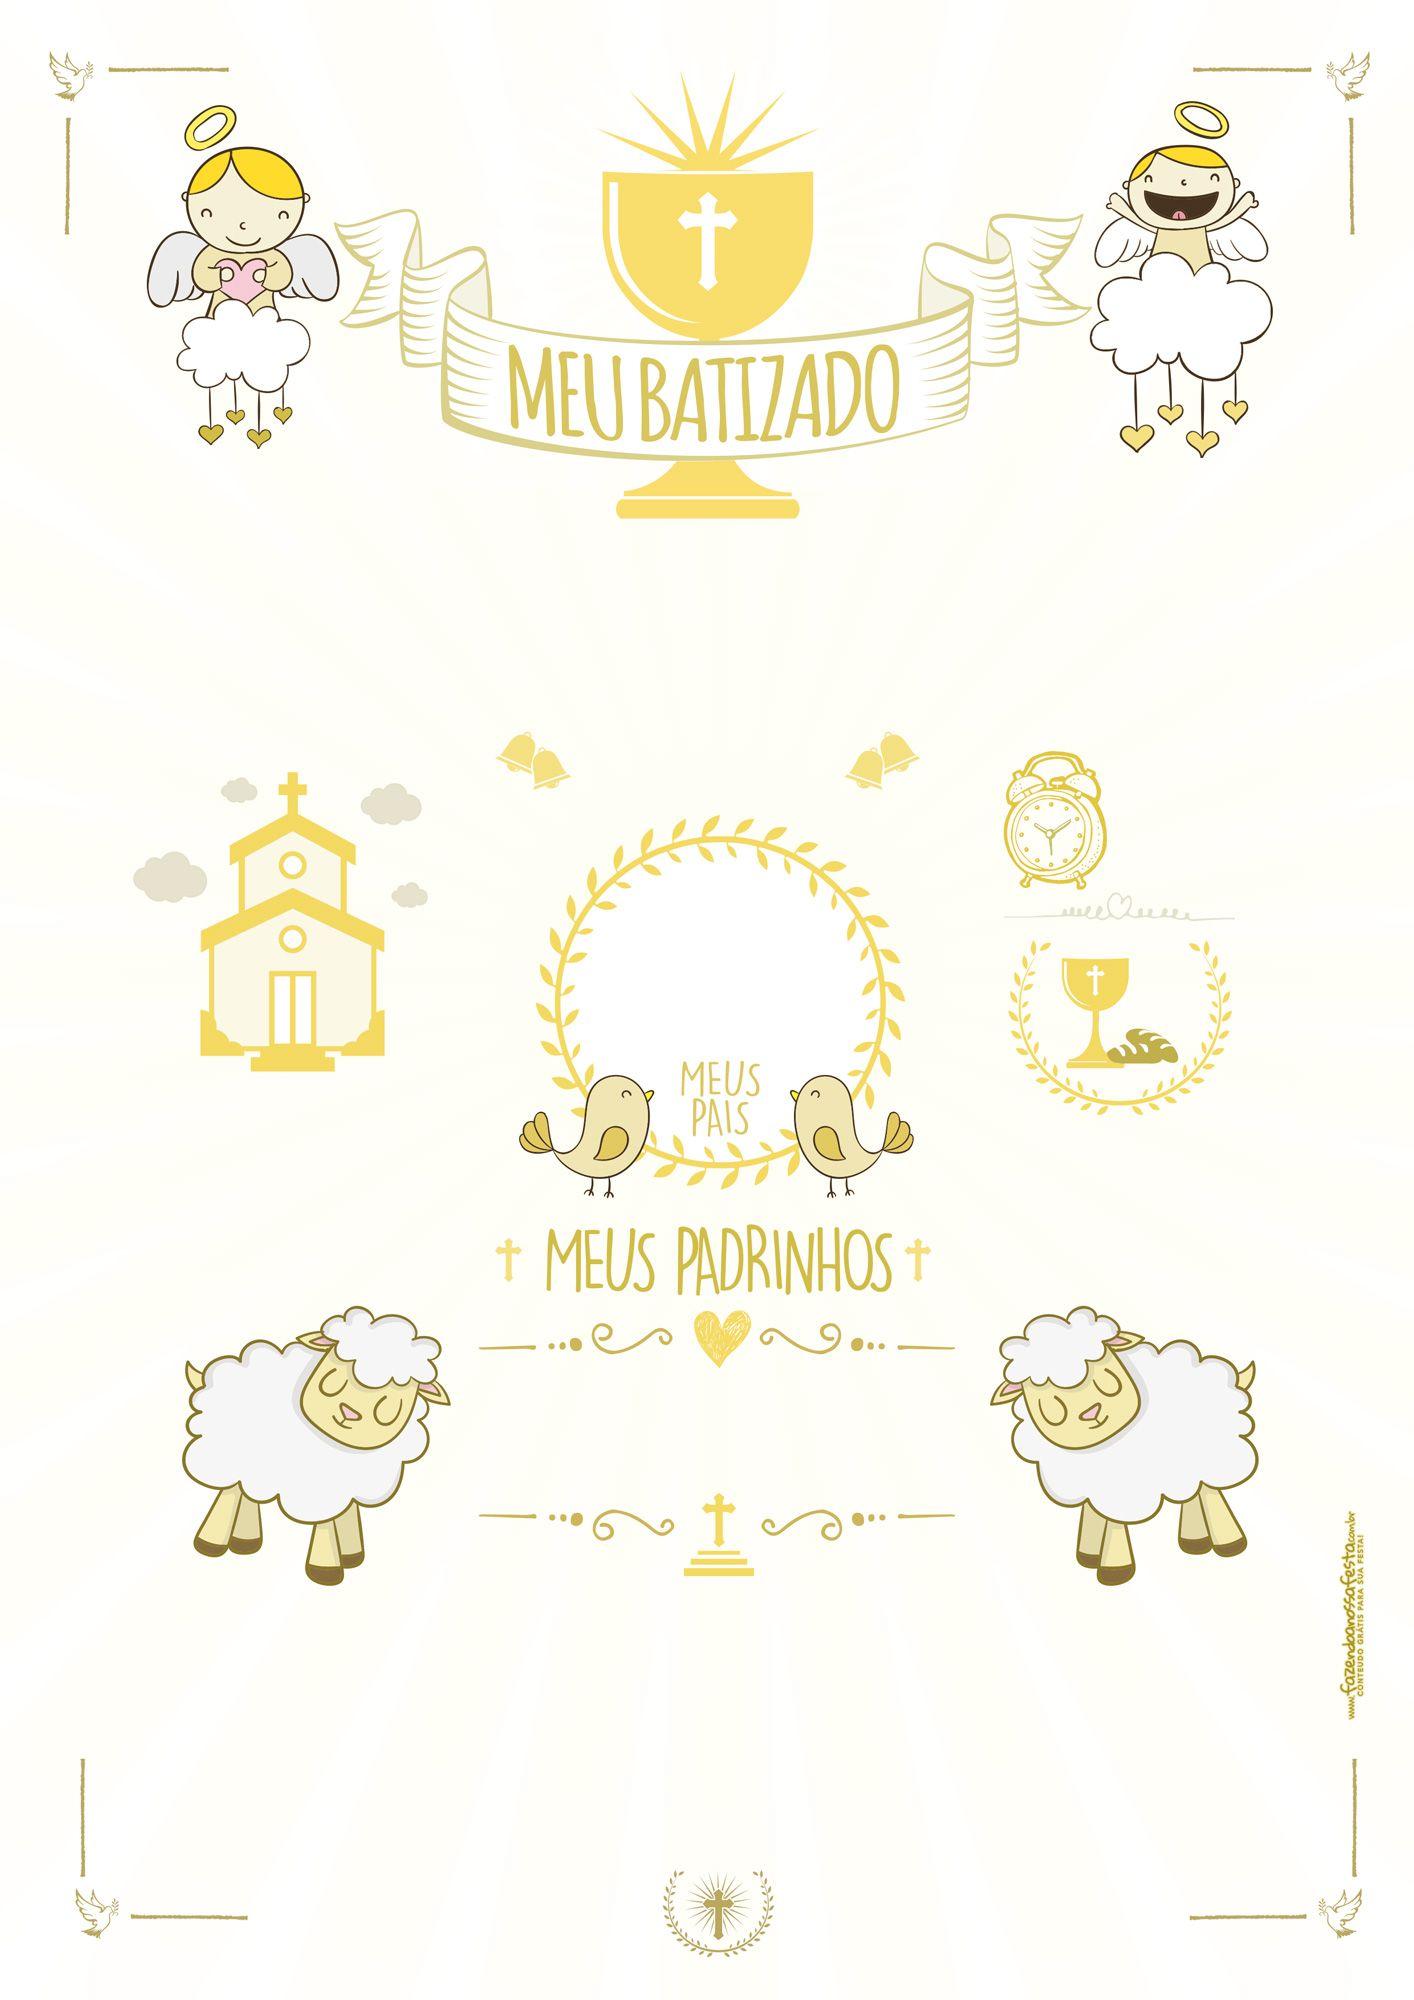 Quadro Batizado Branco E Dourado проекти Pinterest Baby